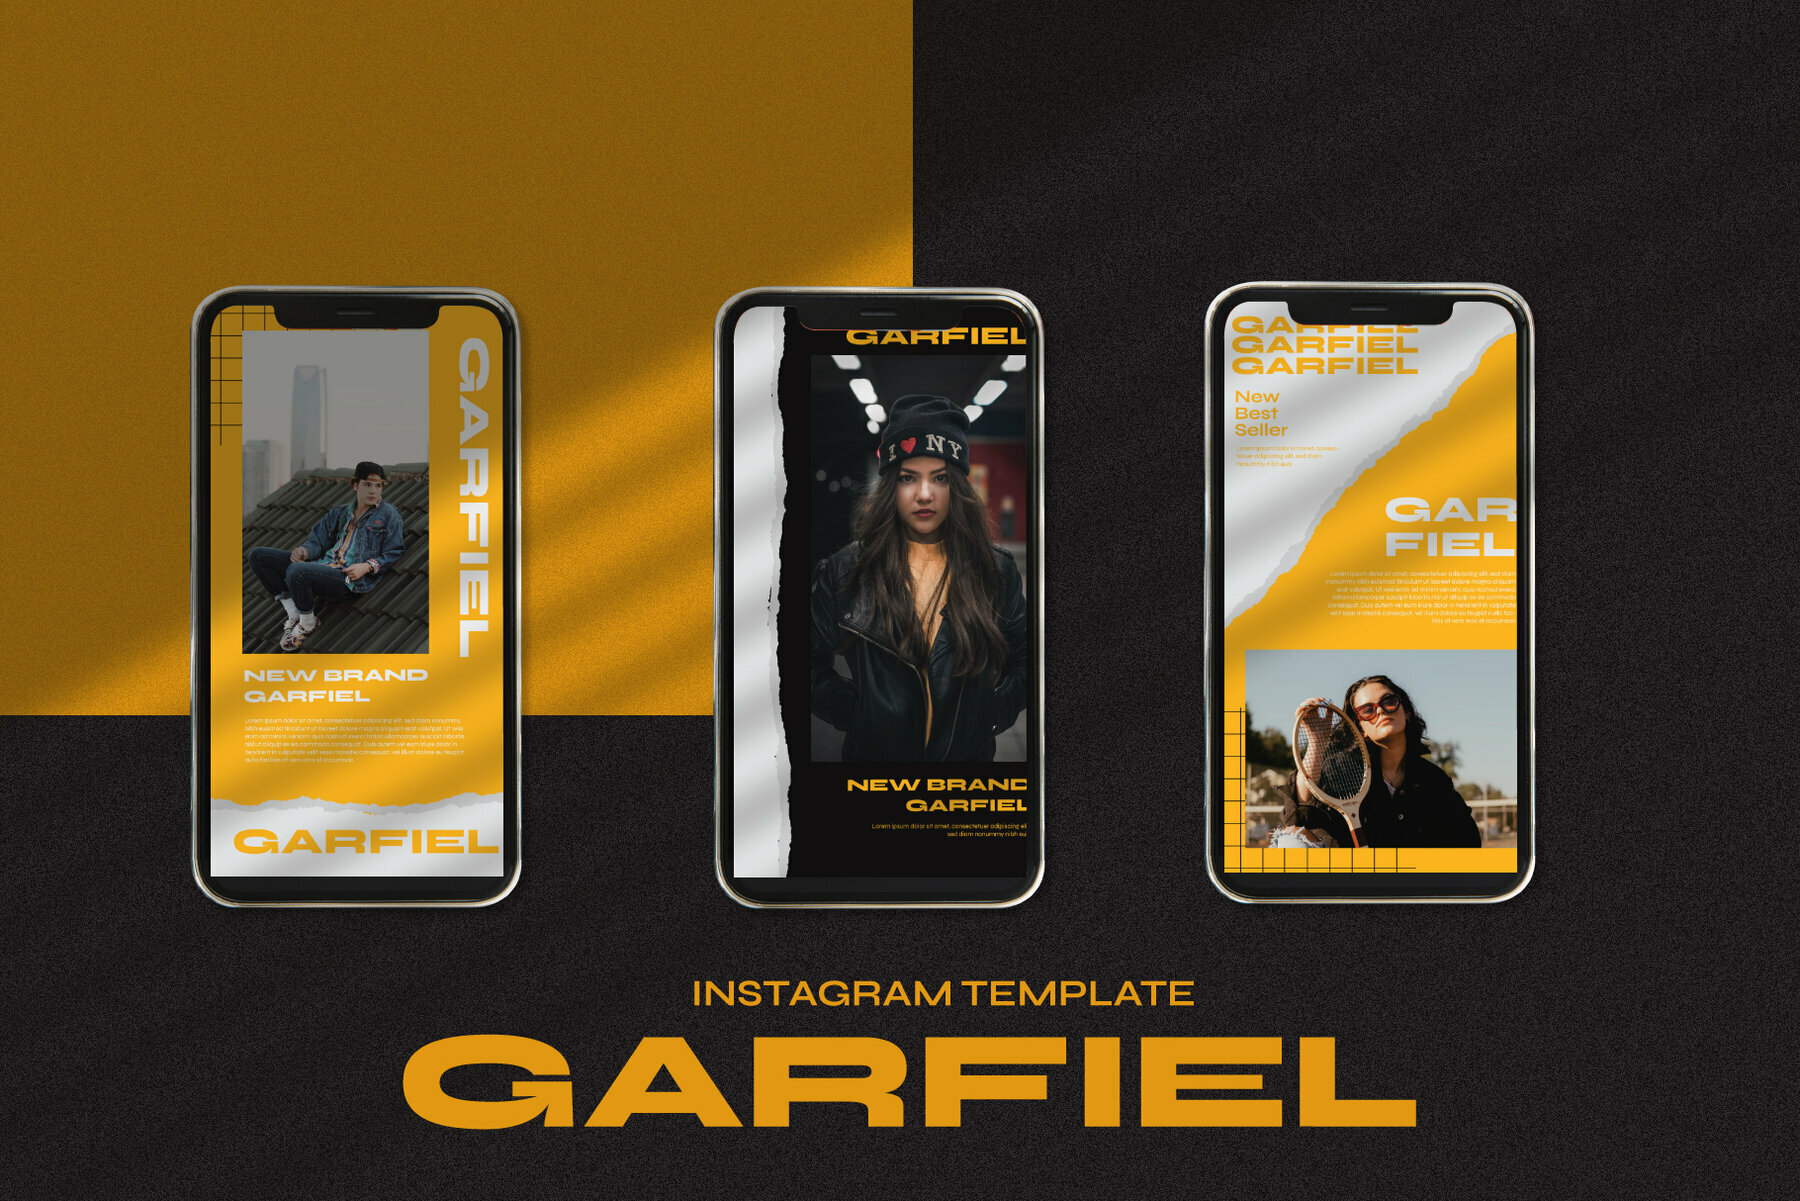 Garfiel Instagram Template